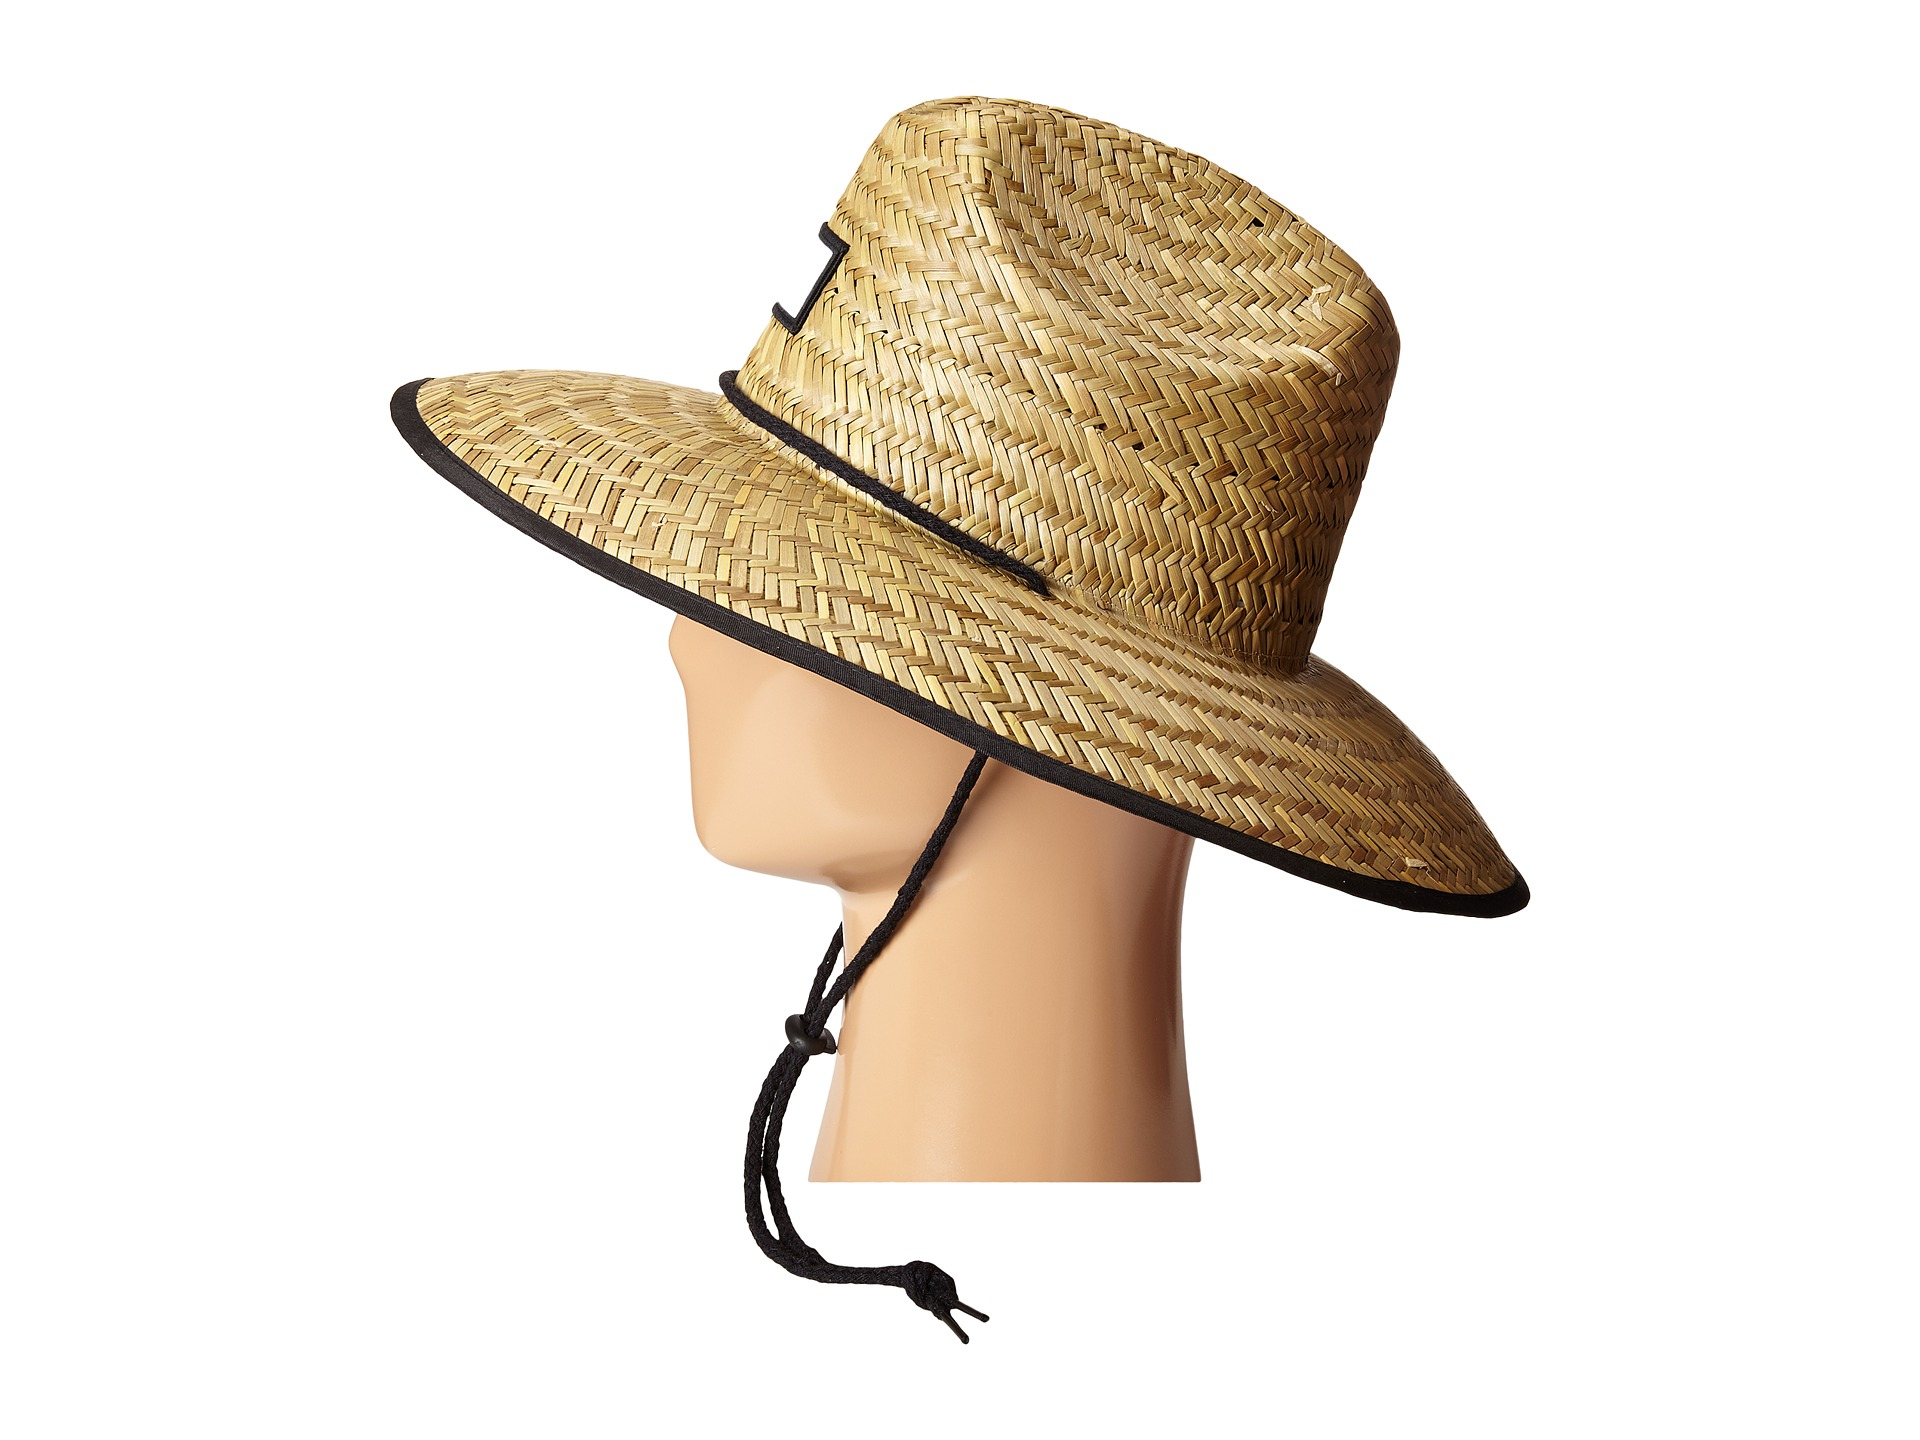 ... uk lyst billabong spectator lifeguard hat 18b13 aa593 384ce51ea2bd